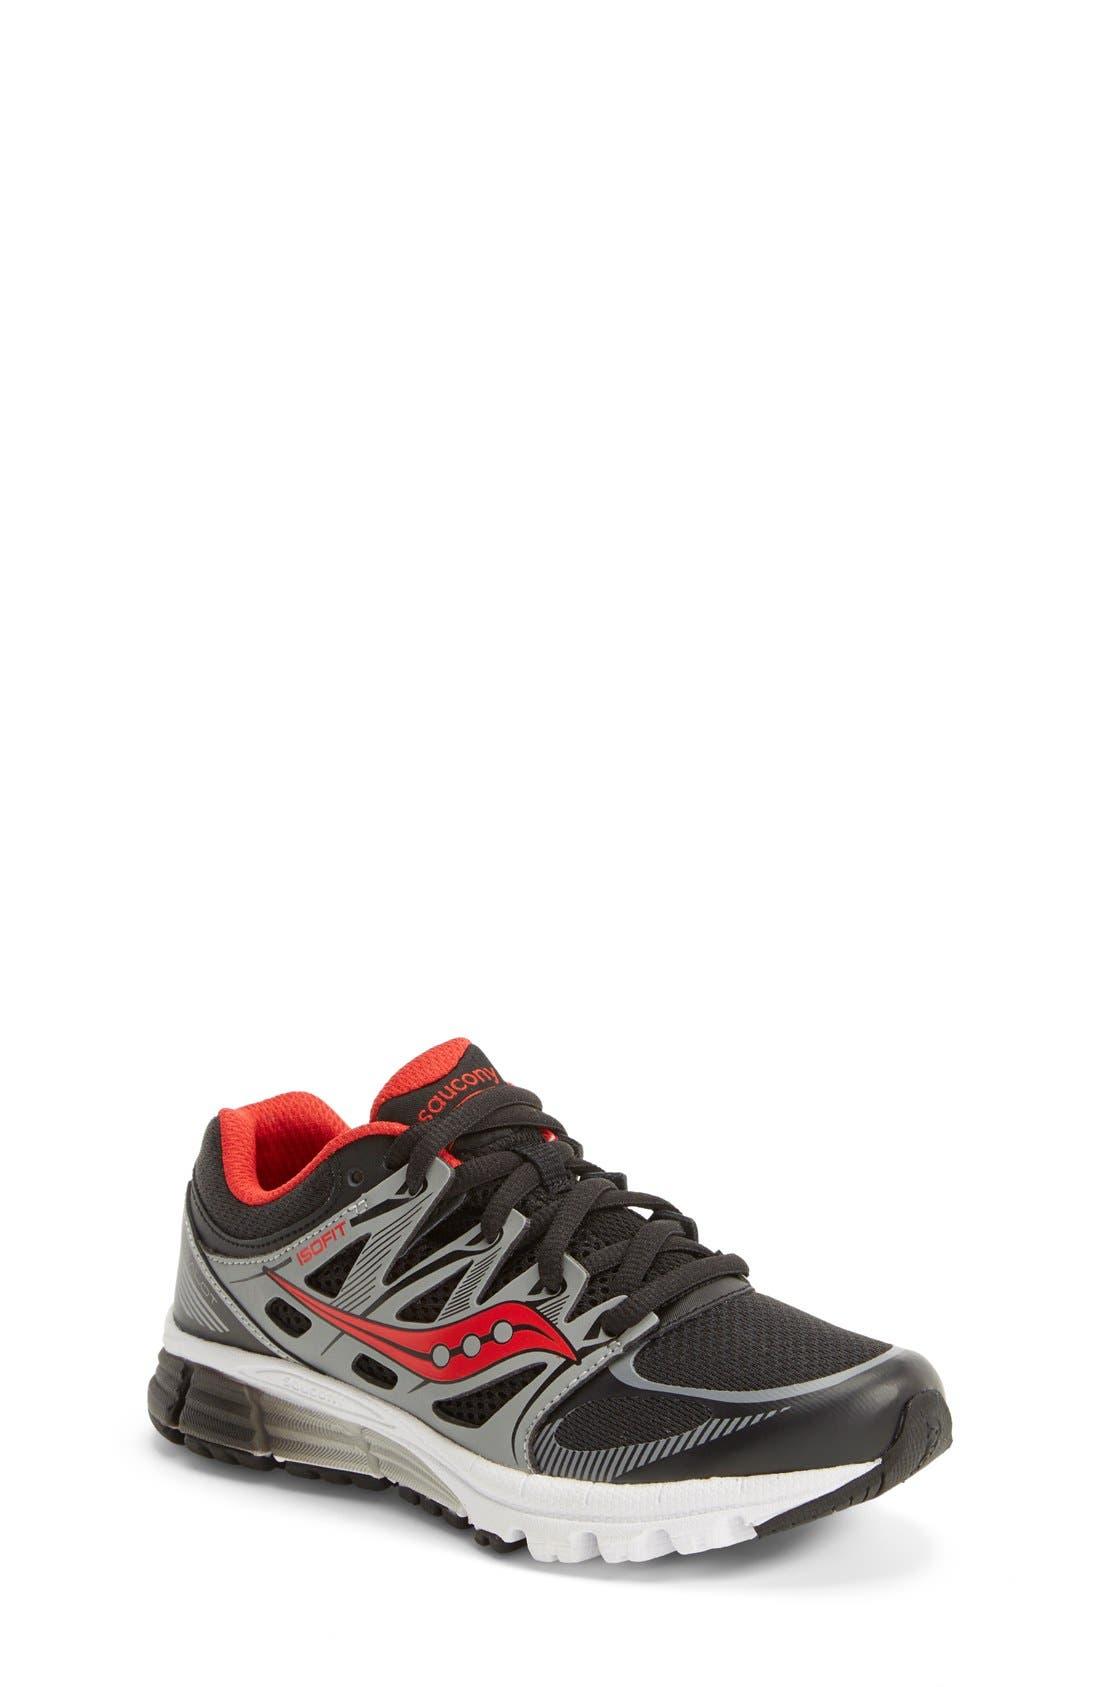 'Zealot' Athletic Shoe,                             Main thumbnail 1, color,                             013